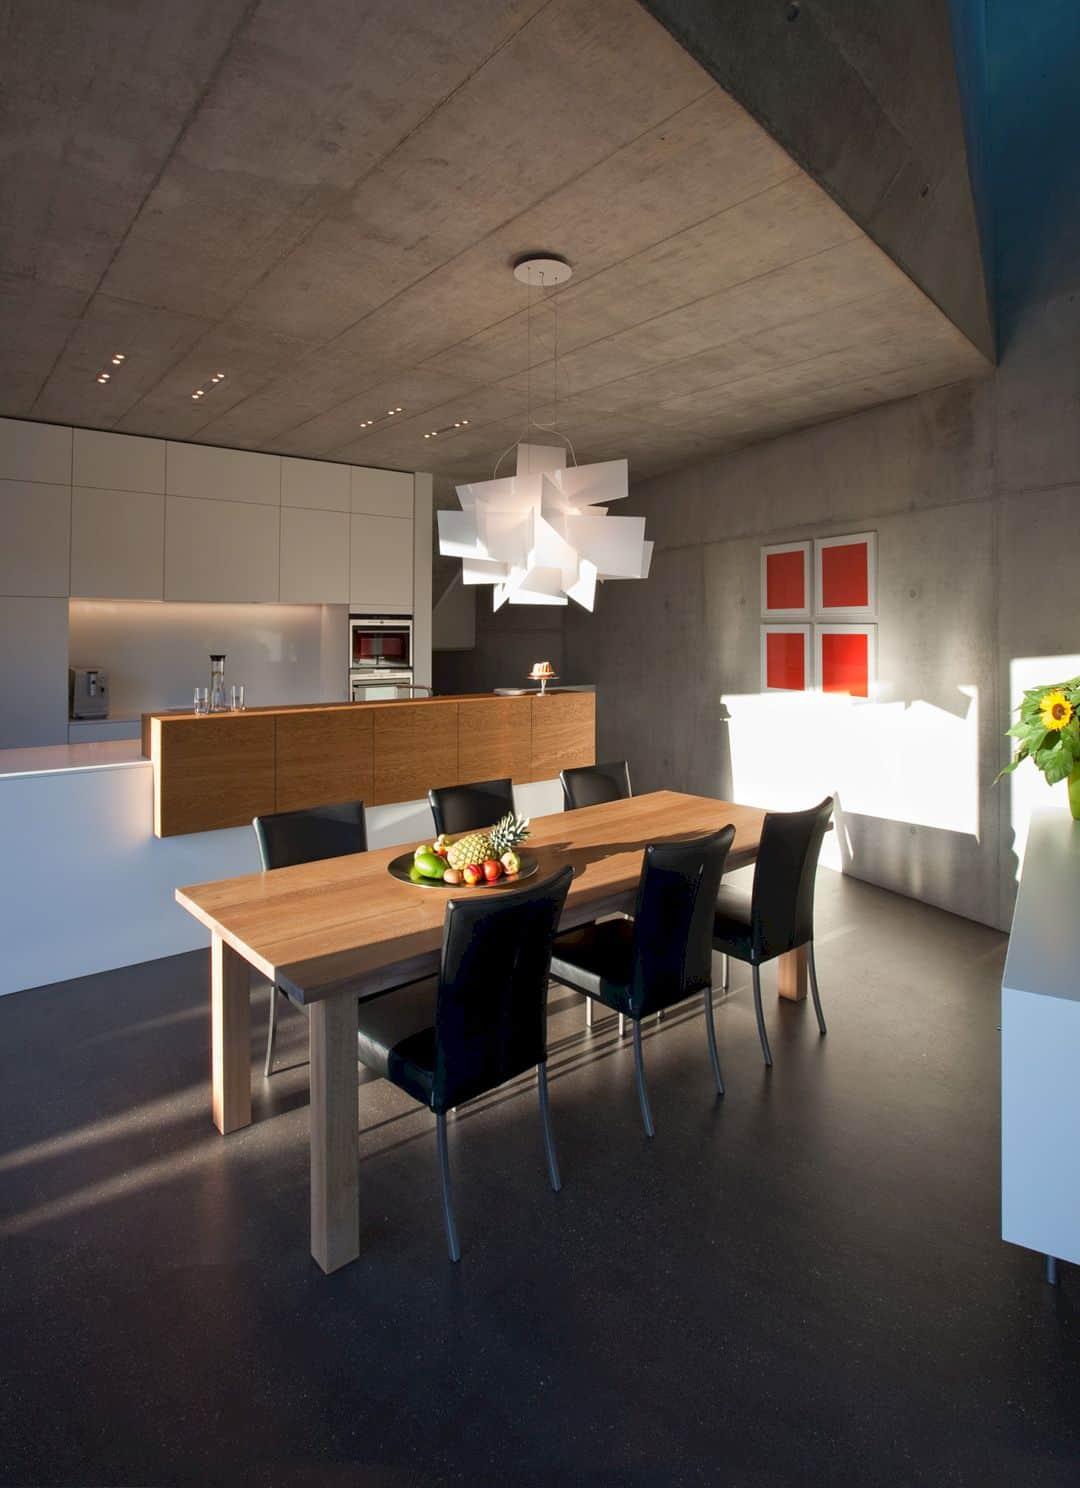 2 EFH Wingert Oberweningen By L3P Architekten 16